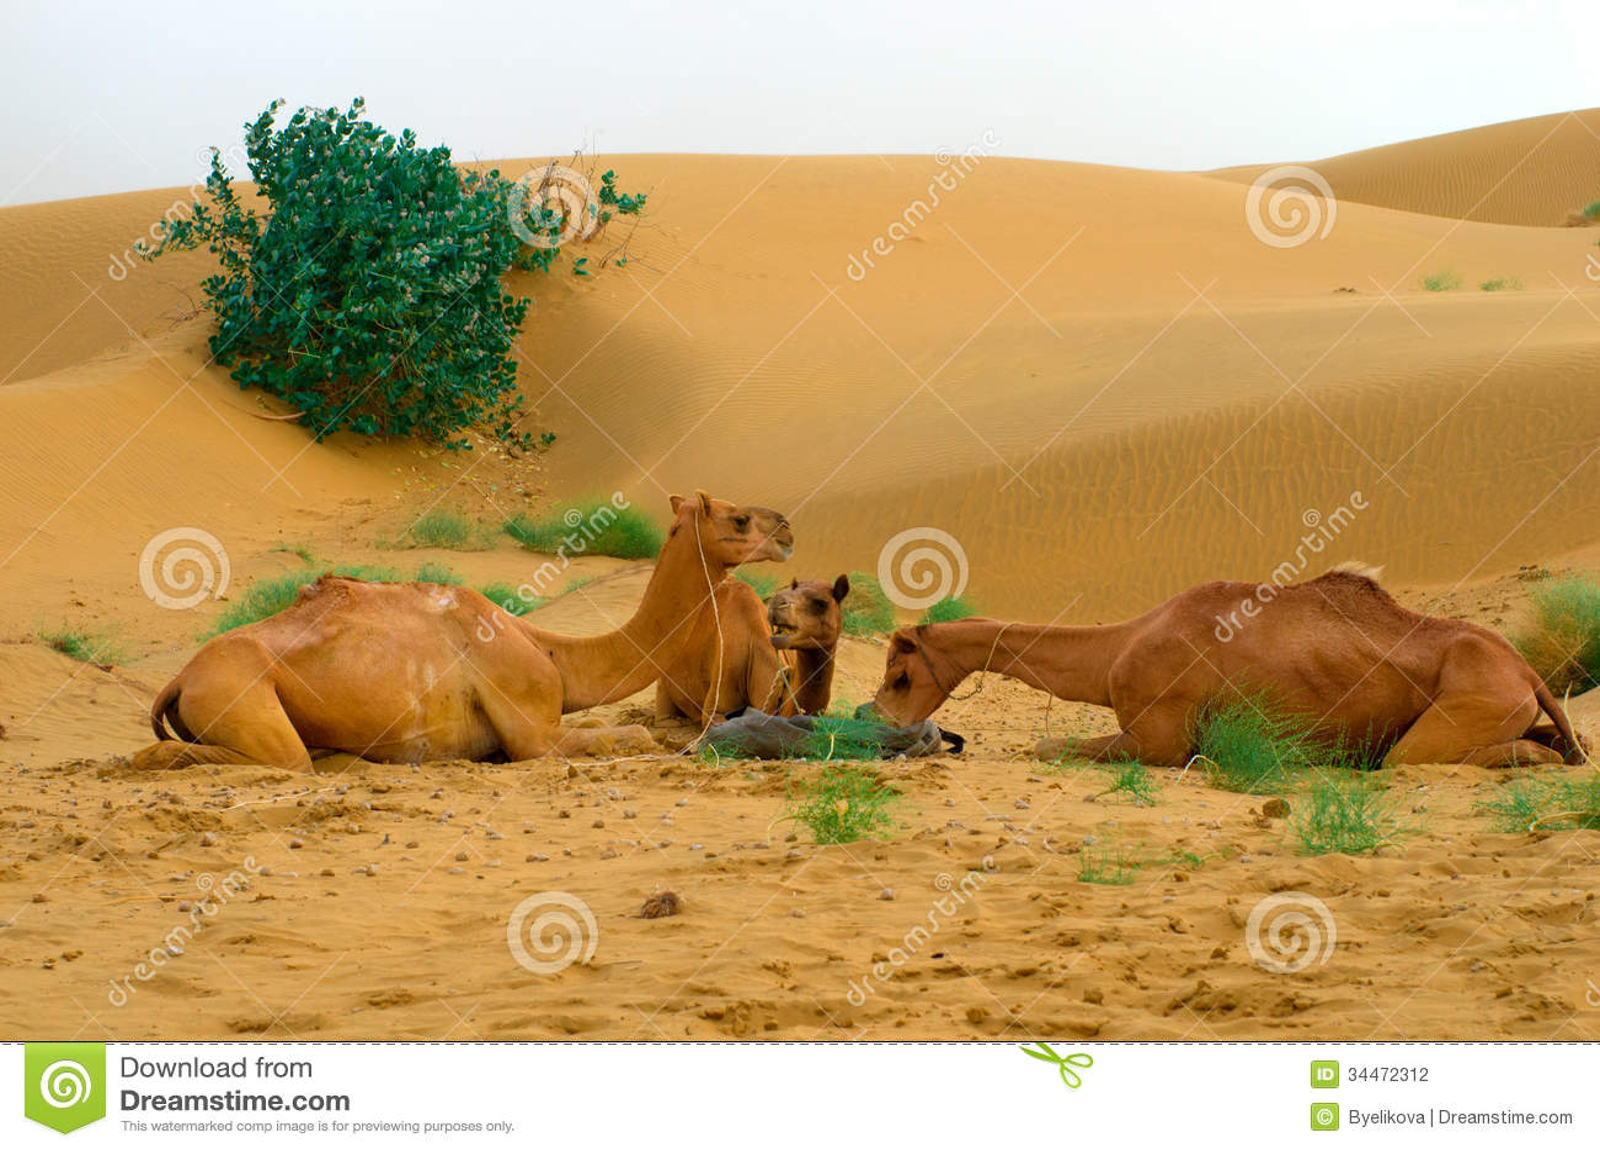 Feeding camels in a desert